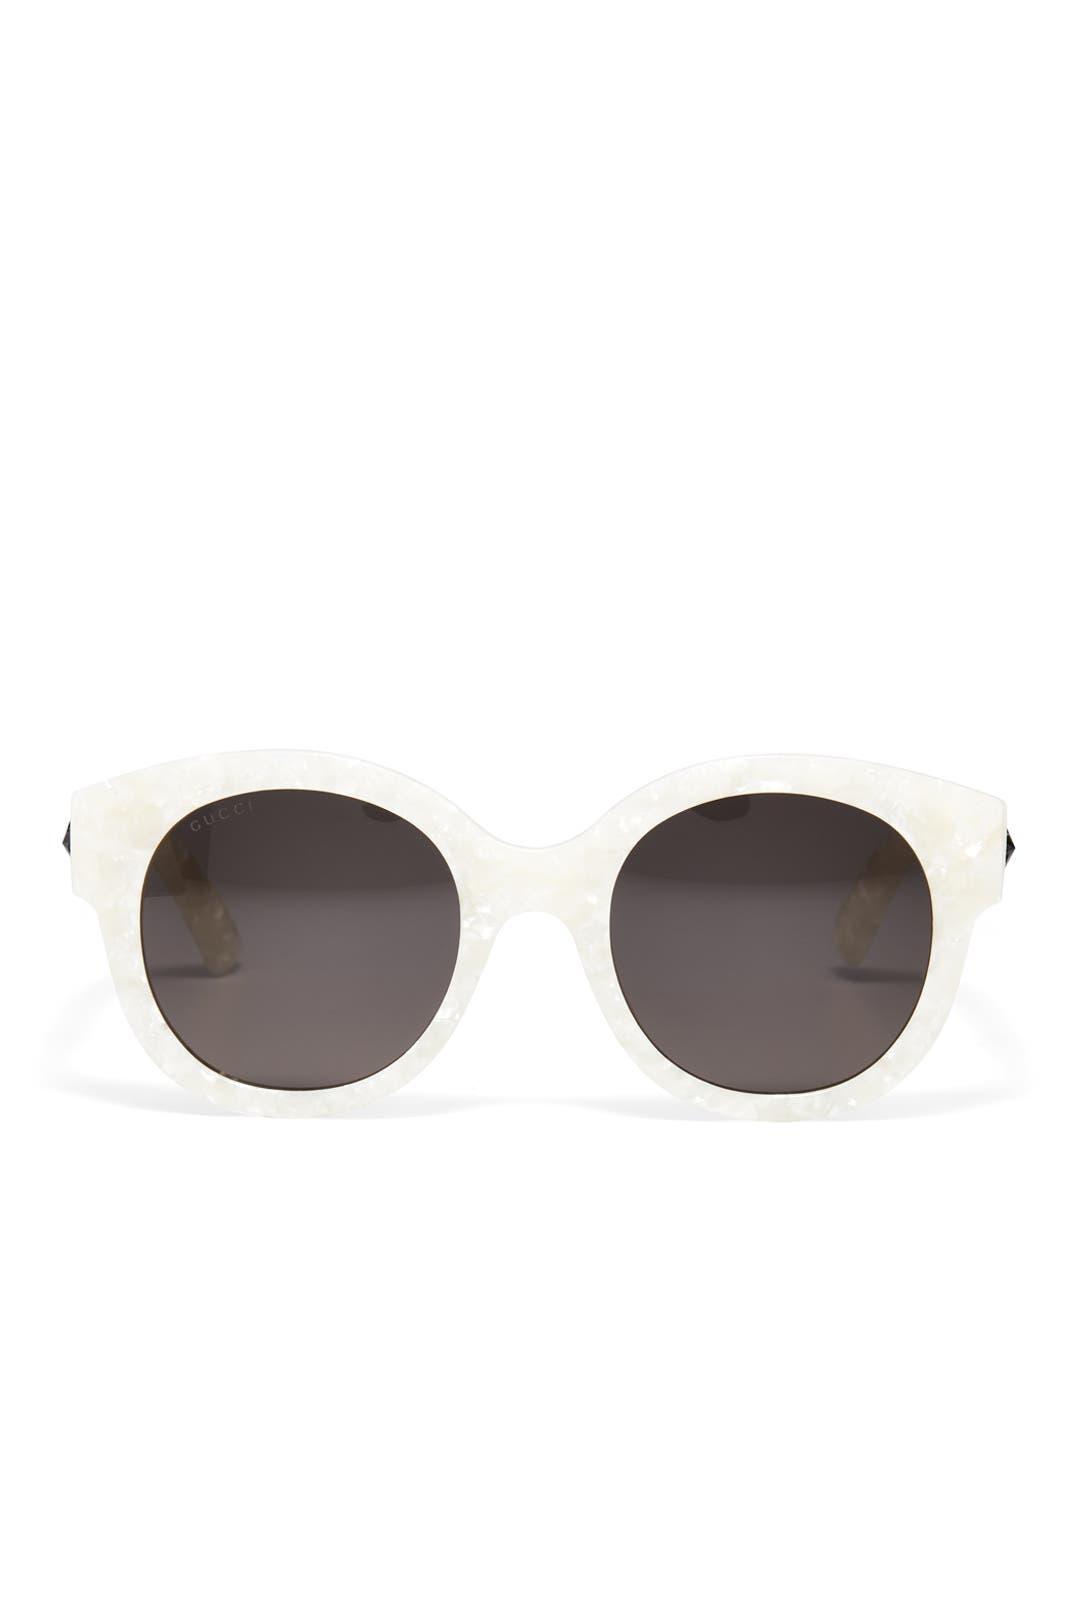 c68152a8d3 Gucci. Read Reviews. Ivory Sunglasses